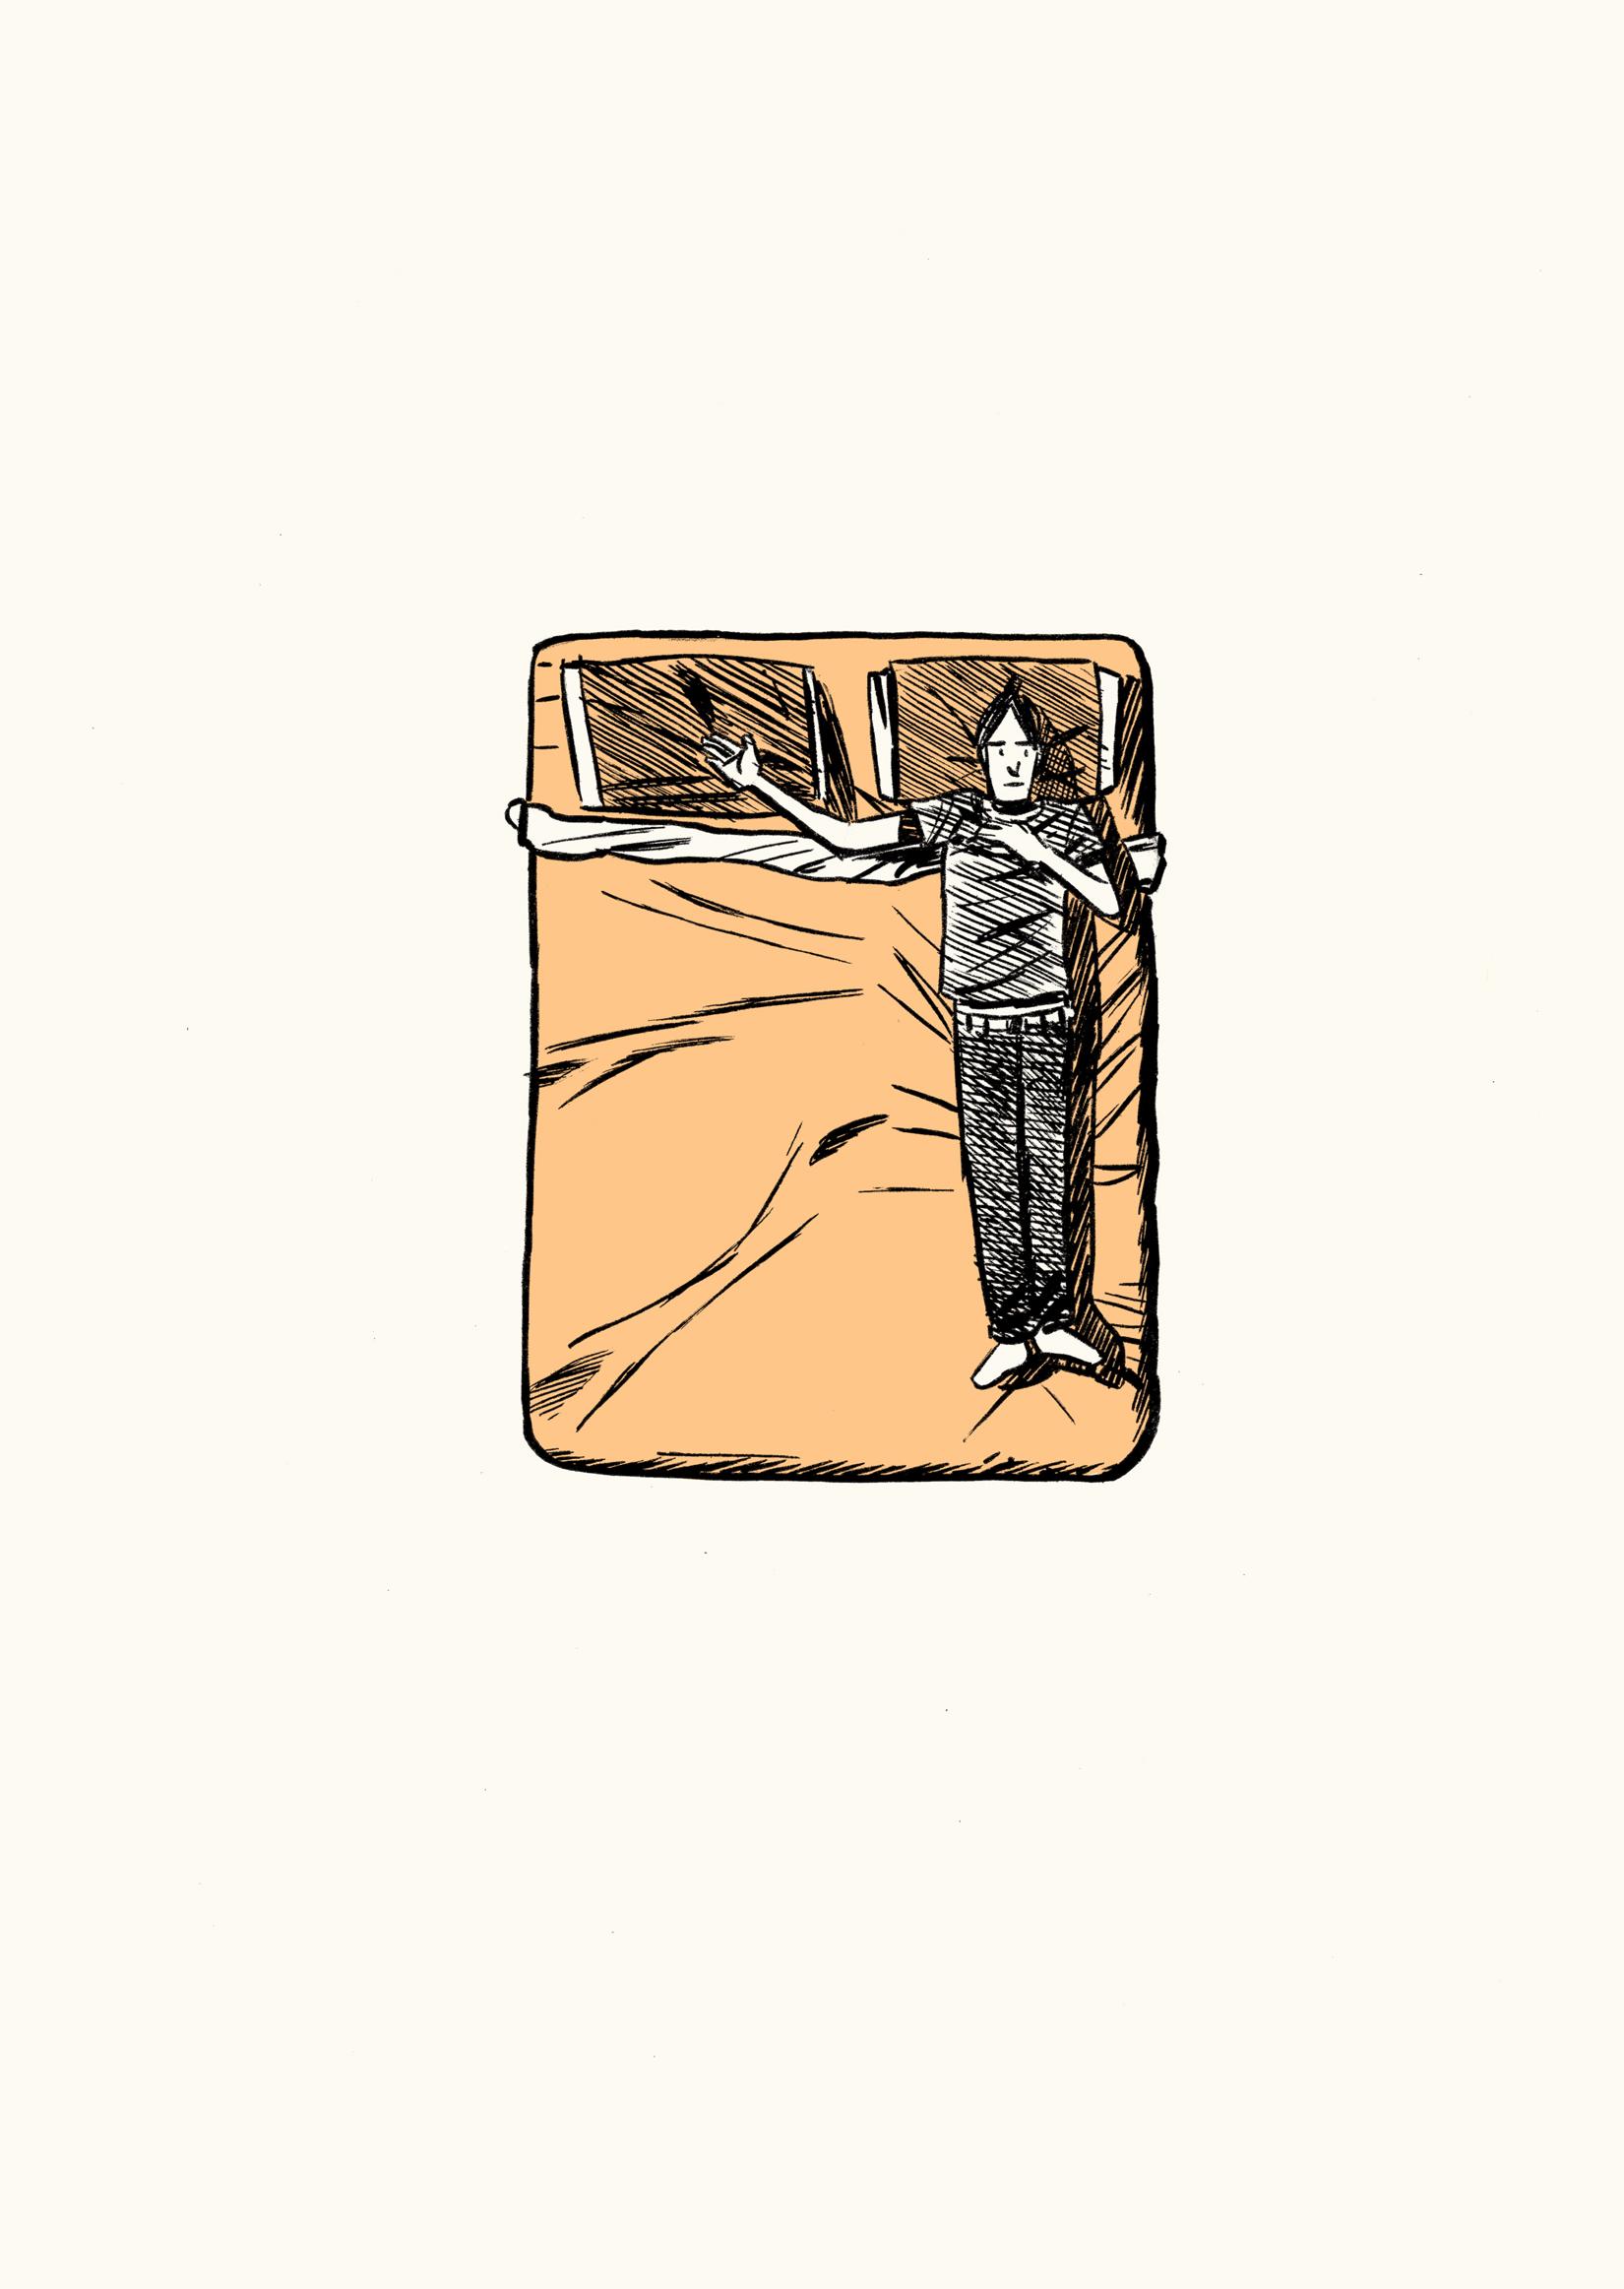 Page 013.jpg